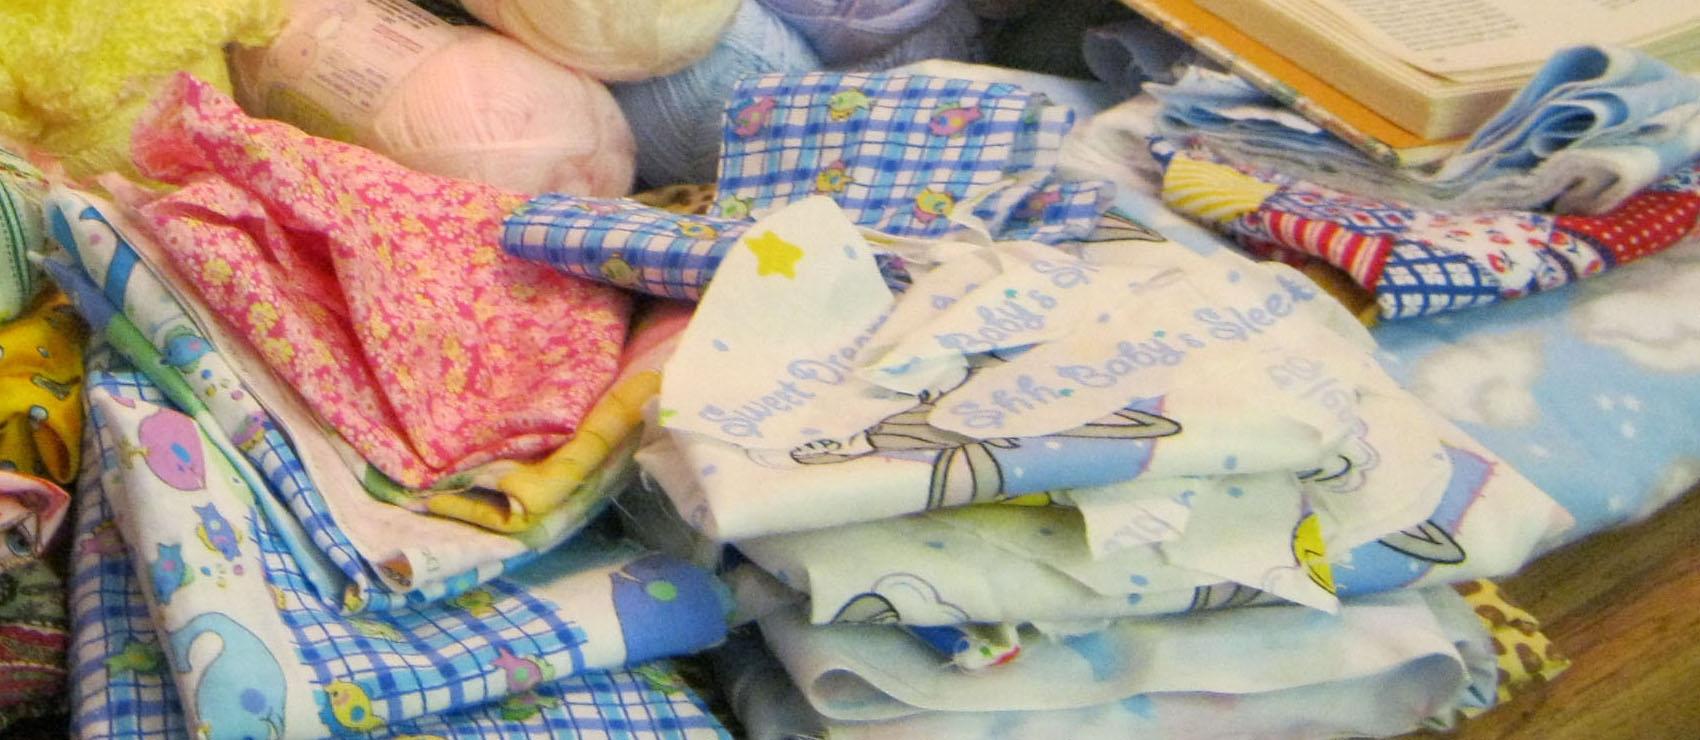 Baby Fabric Scraps